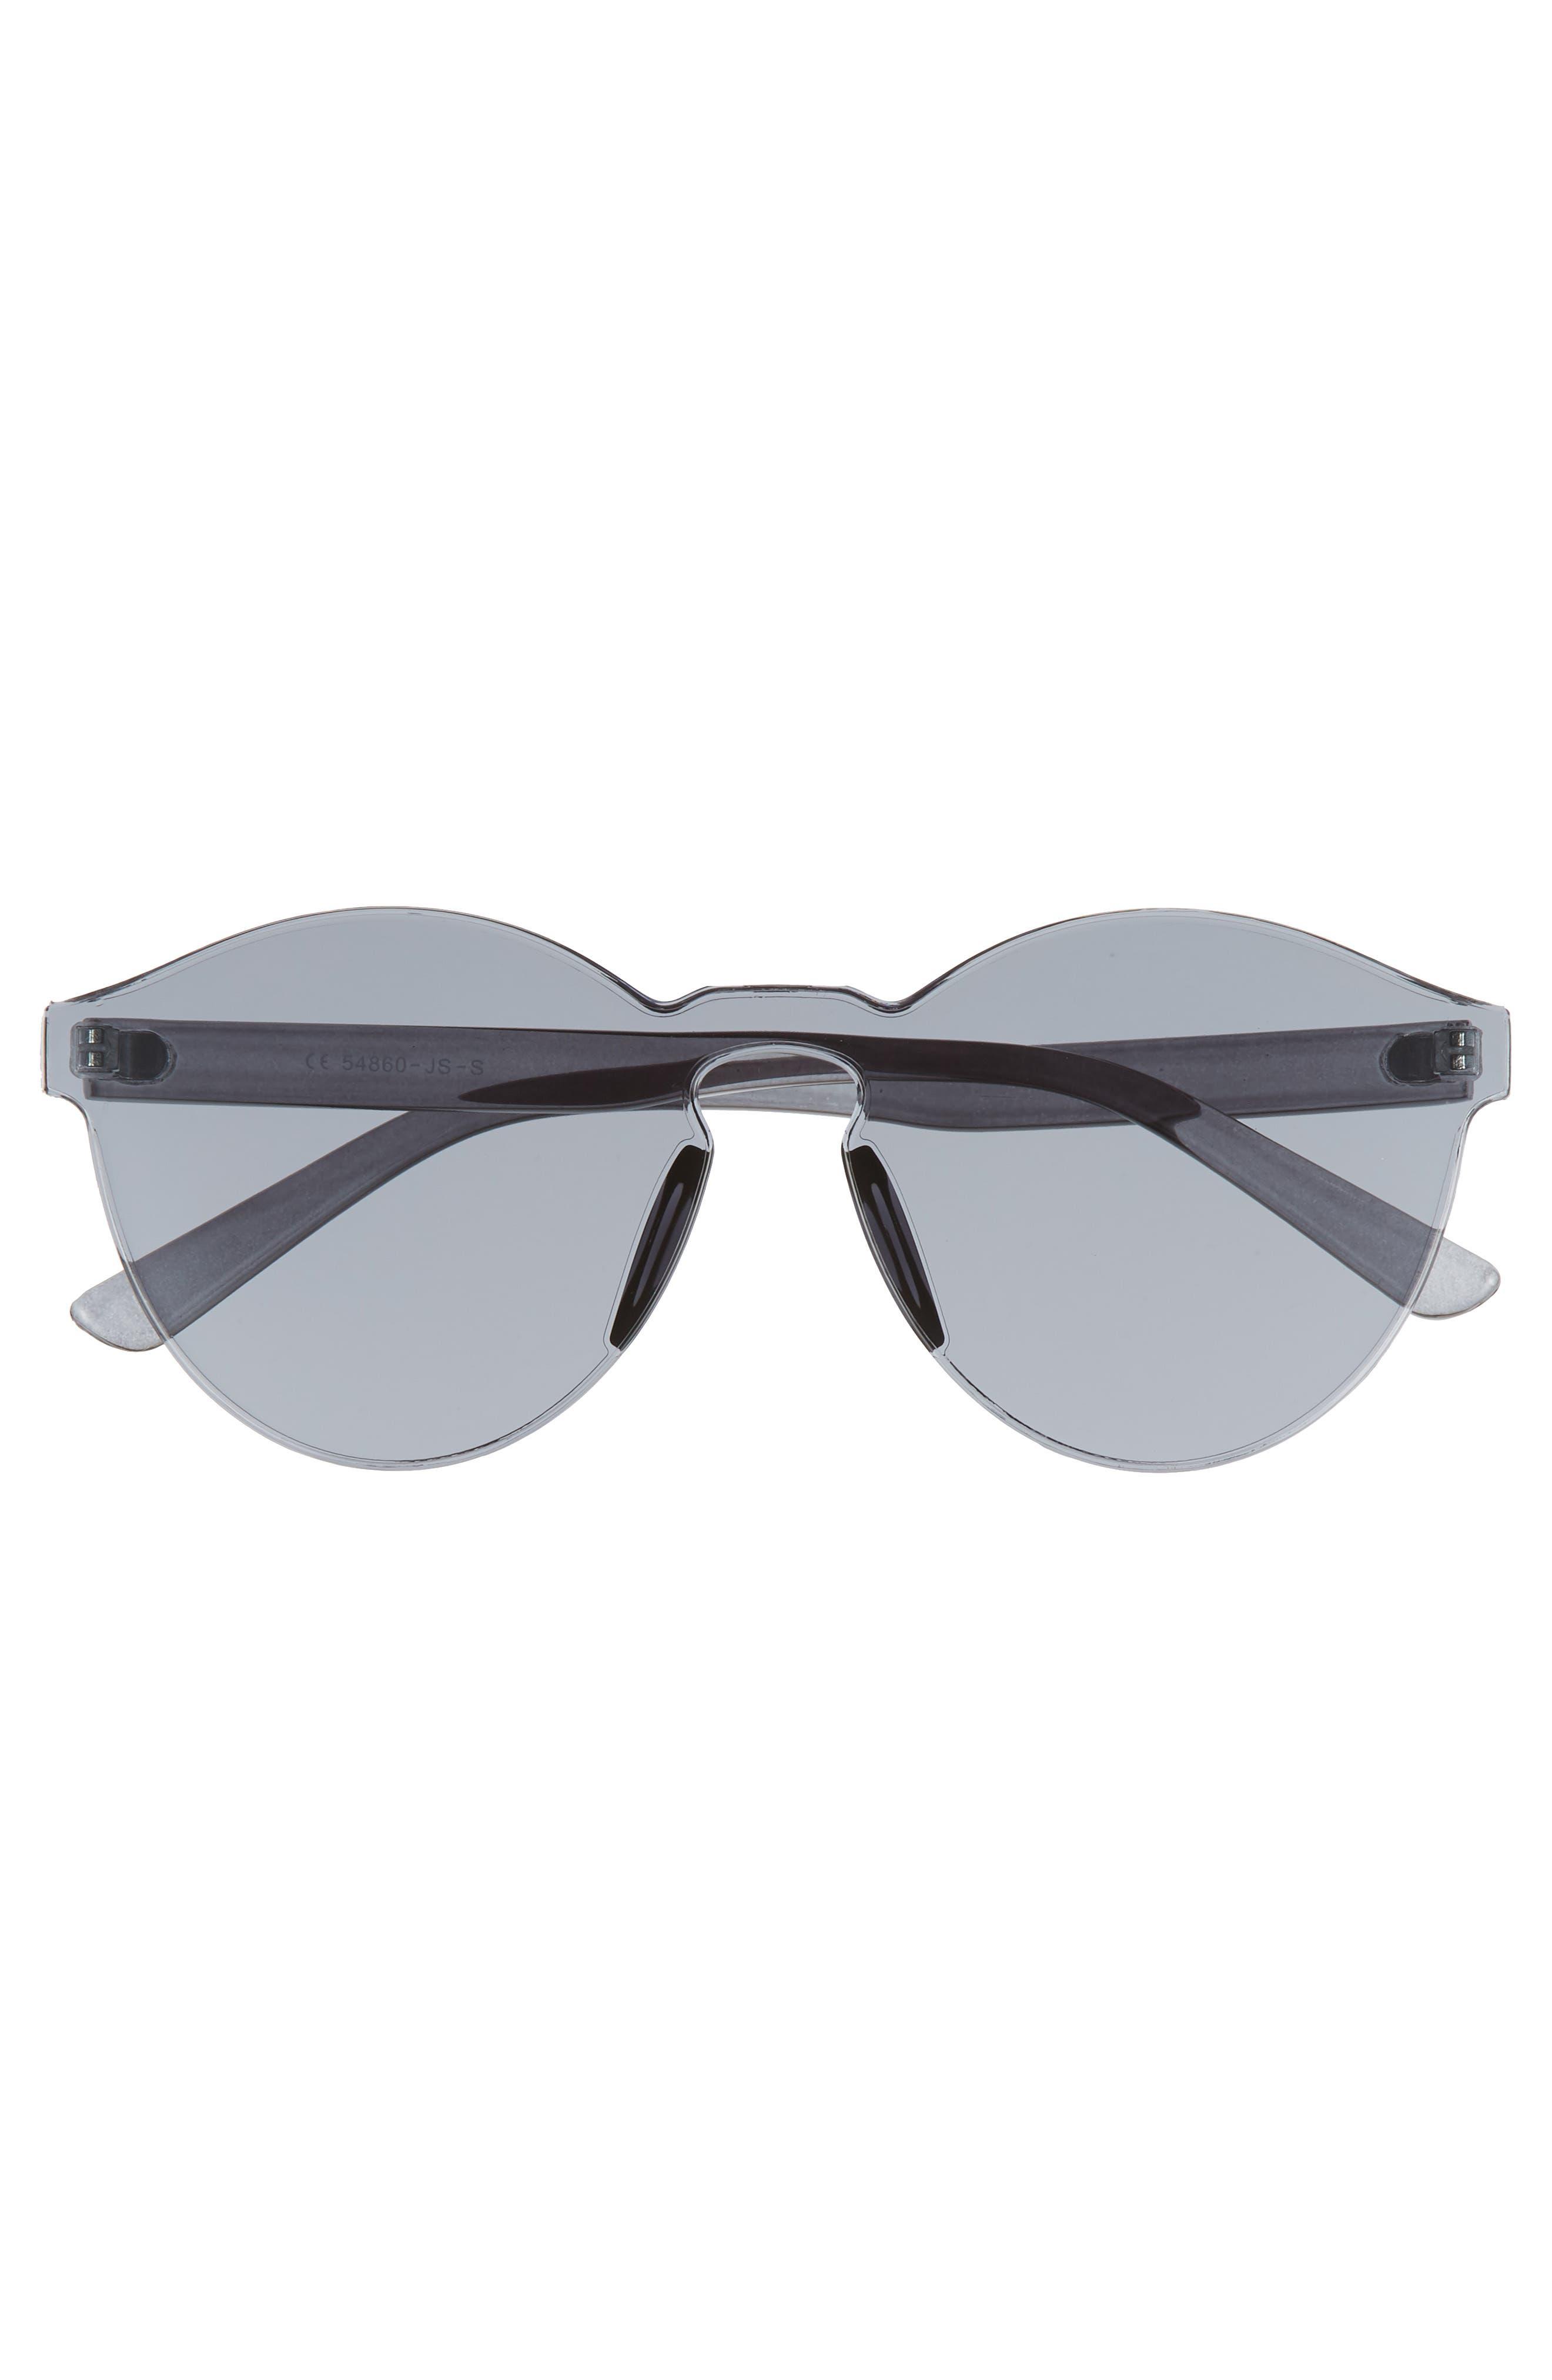 56mm Rimless Round Sunglasses,                             Alternate thumbnail 3, color,                             001